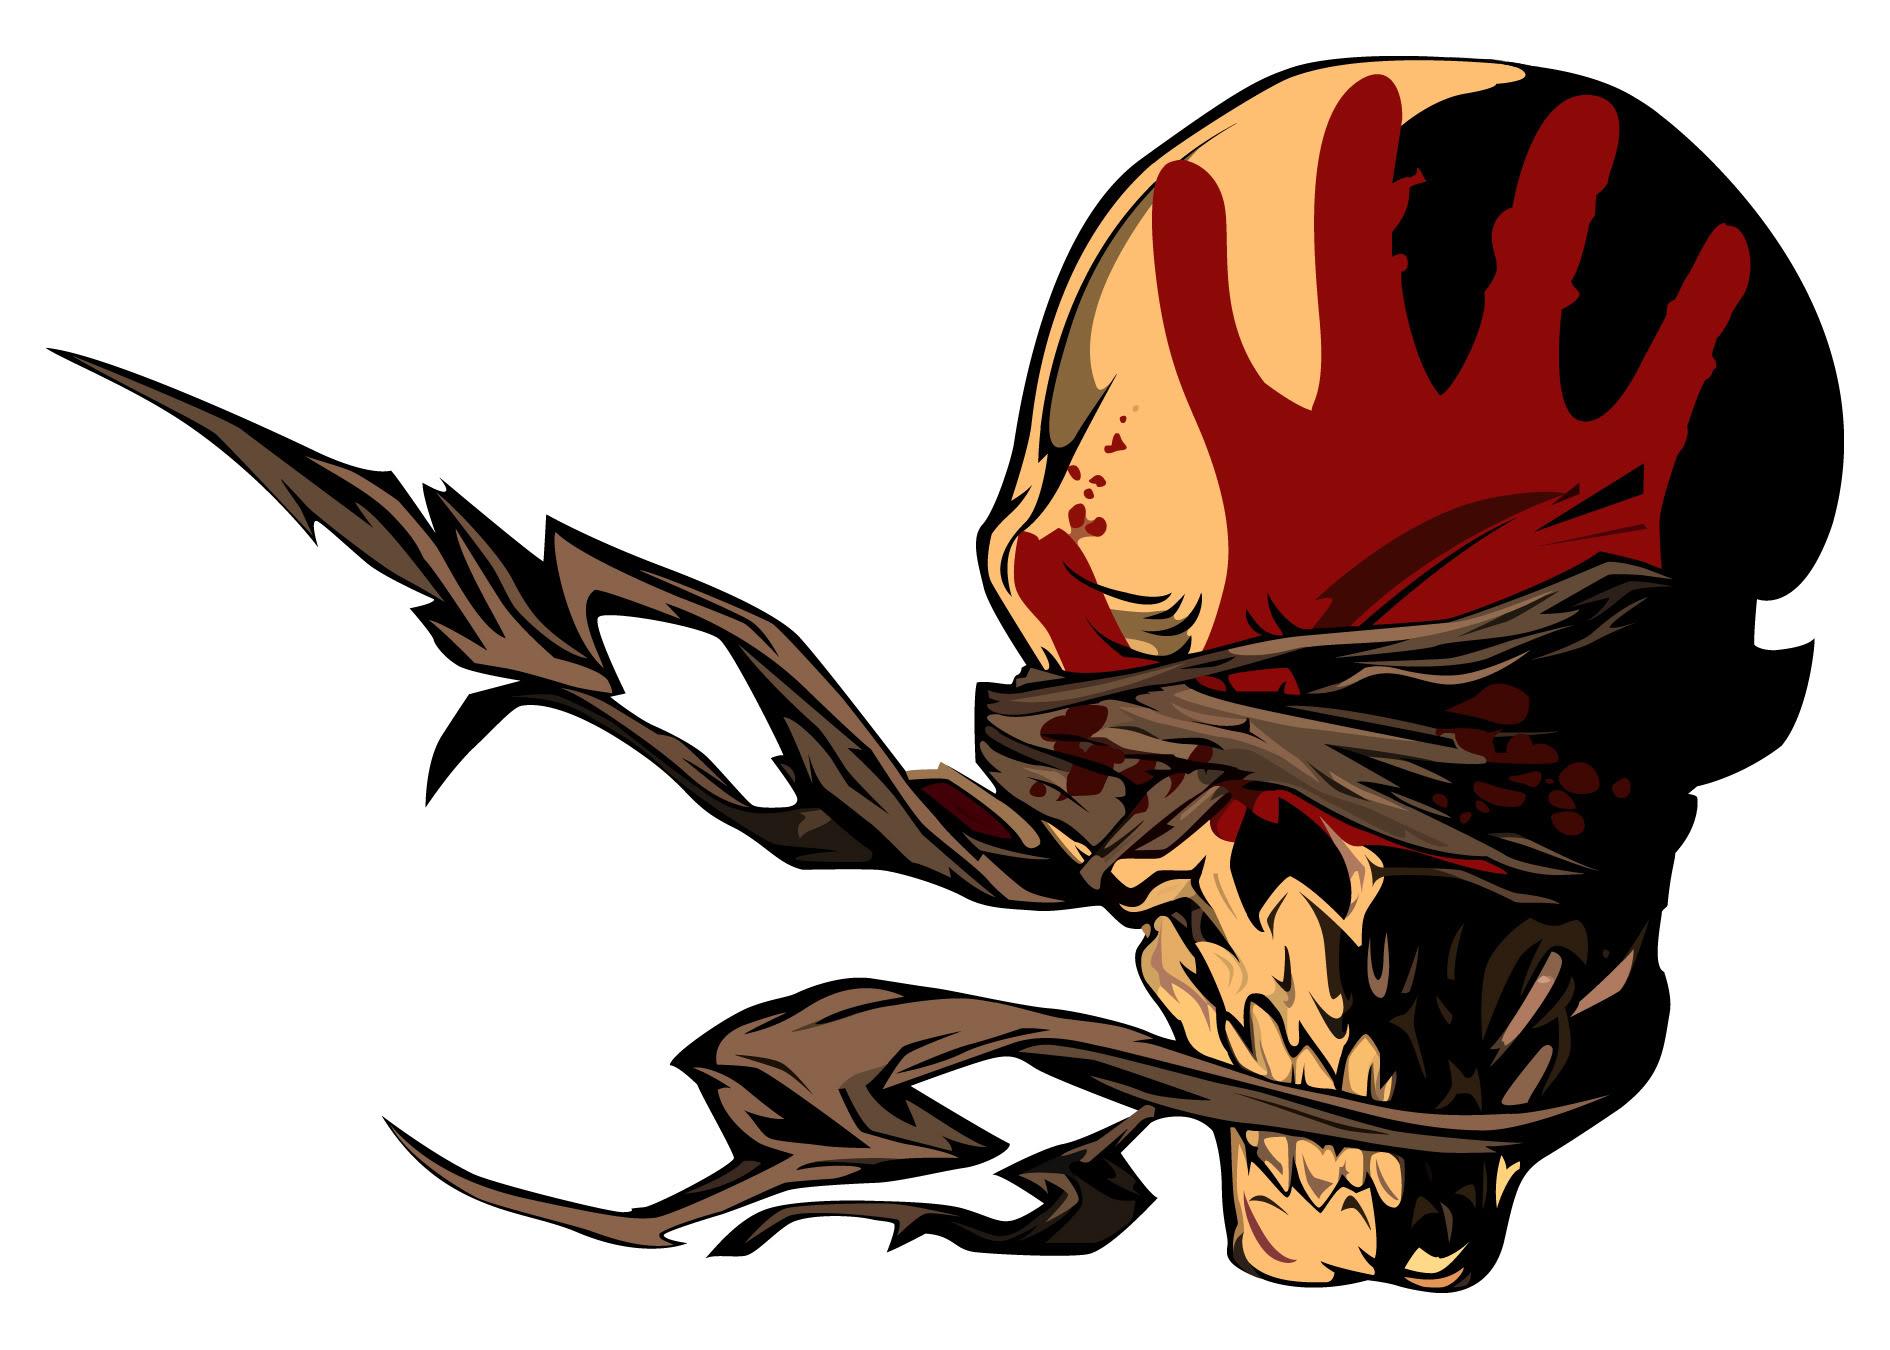 hard rock bands skull - photo #27